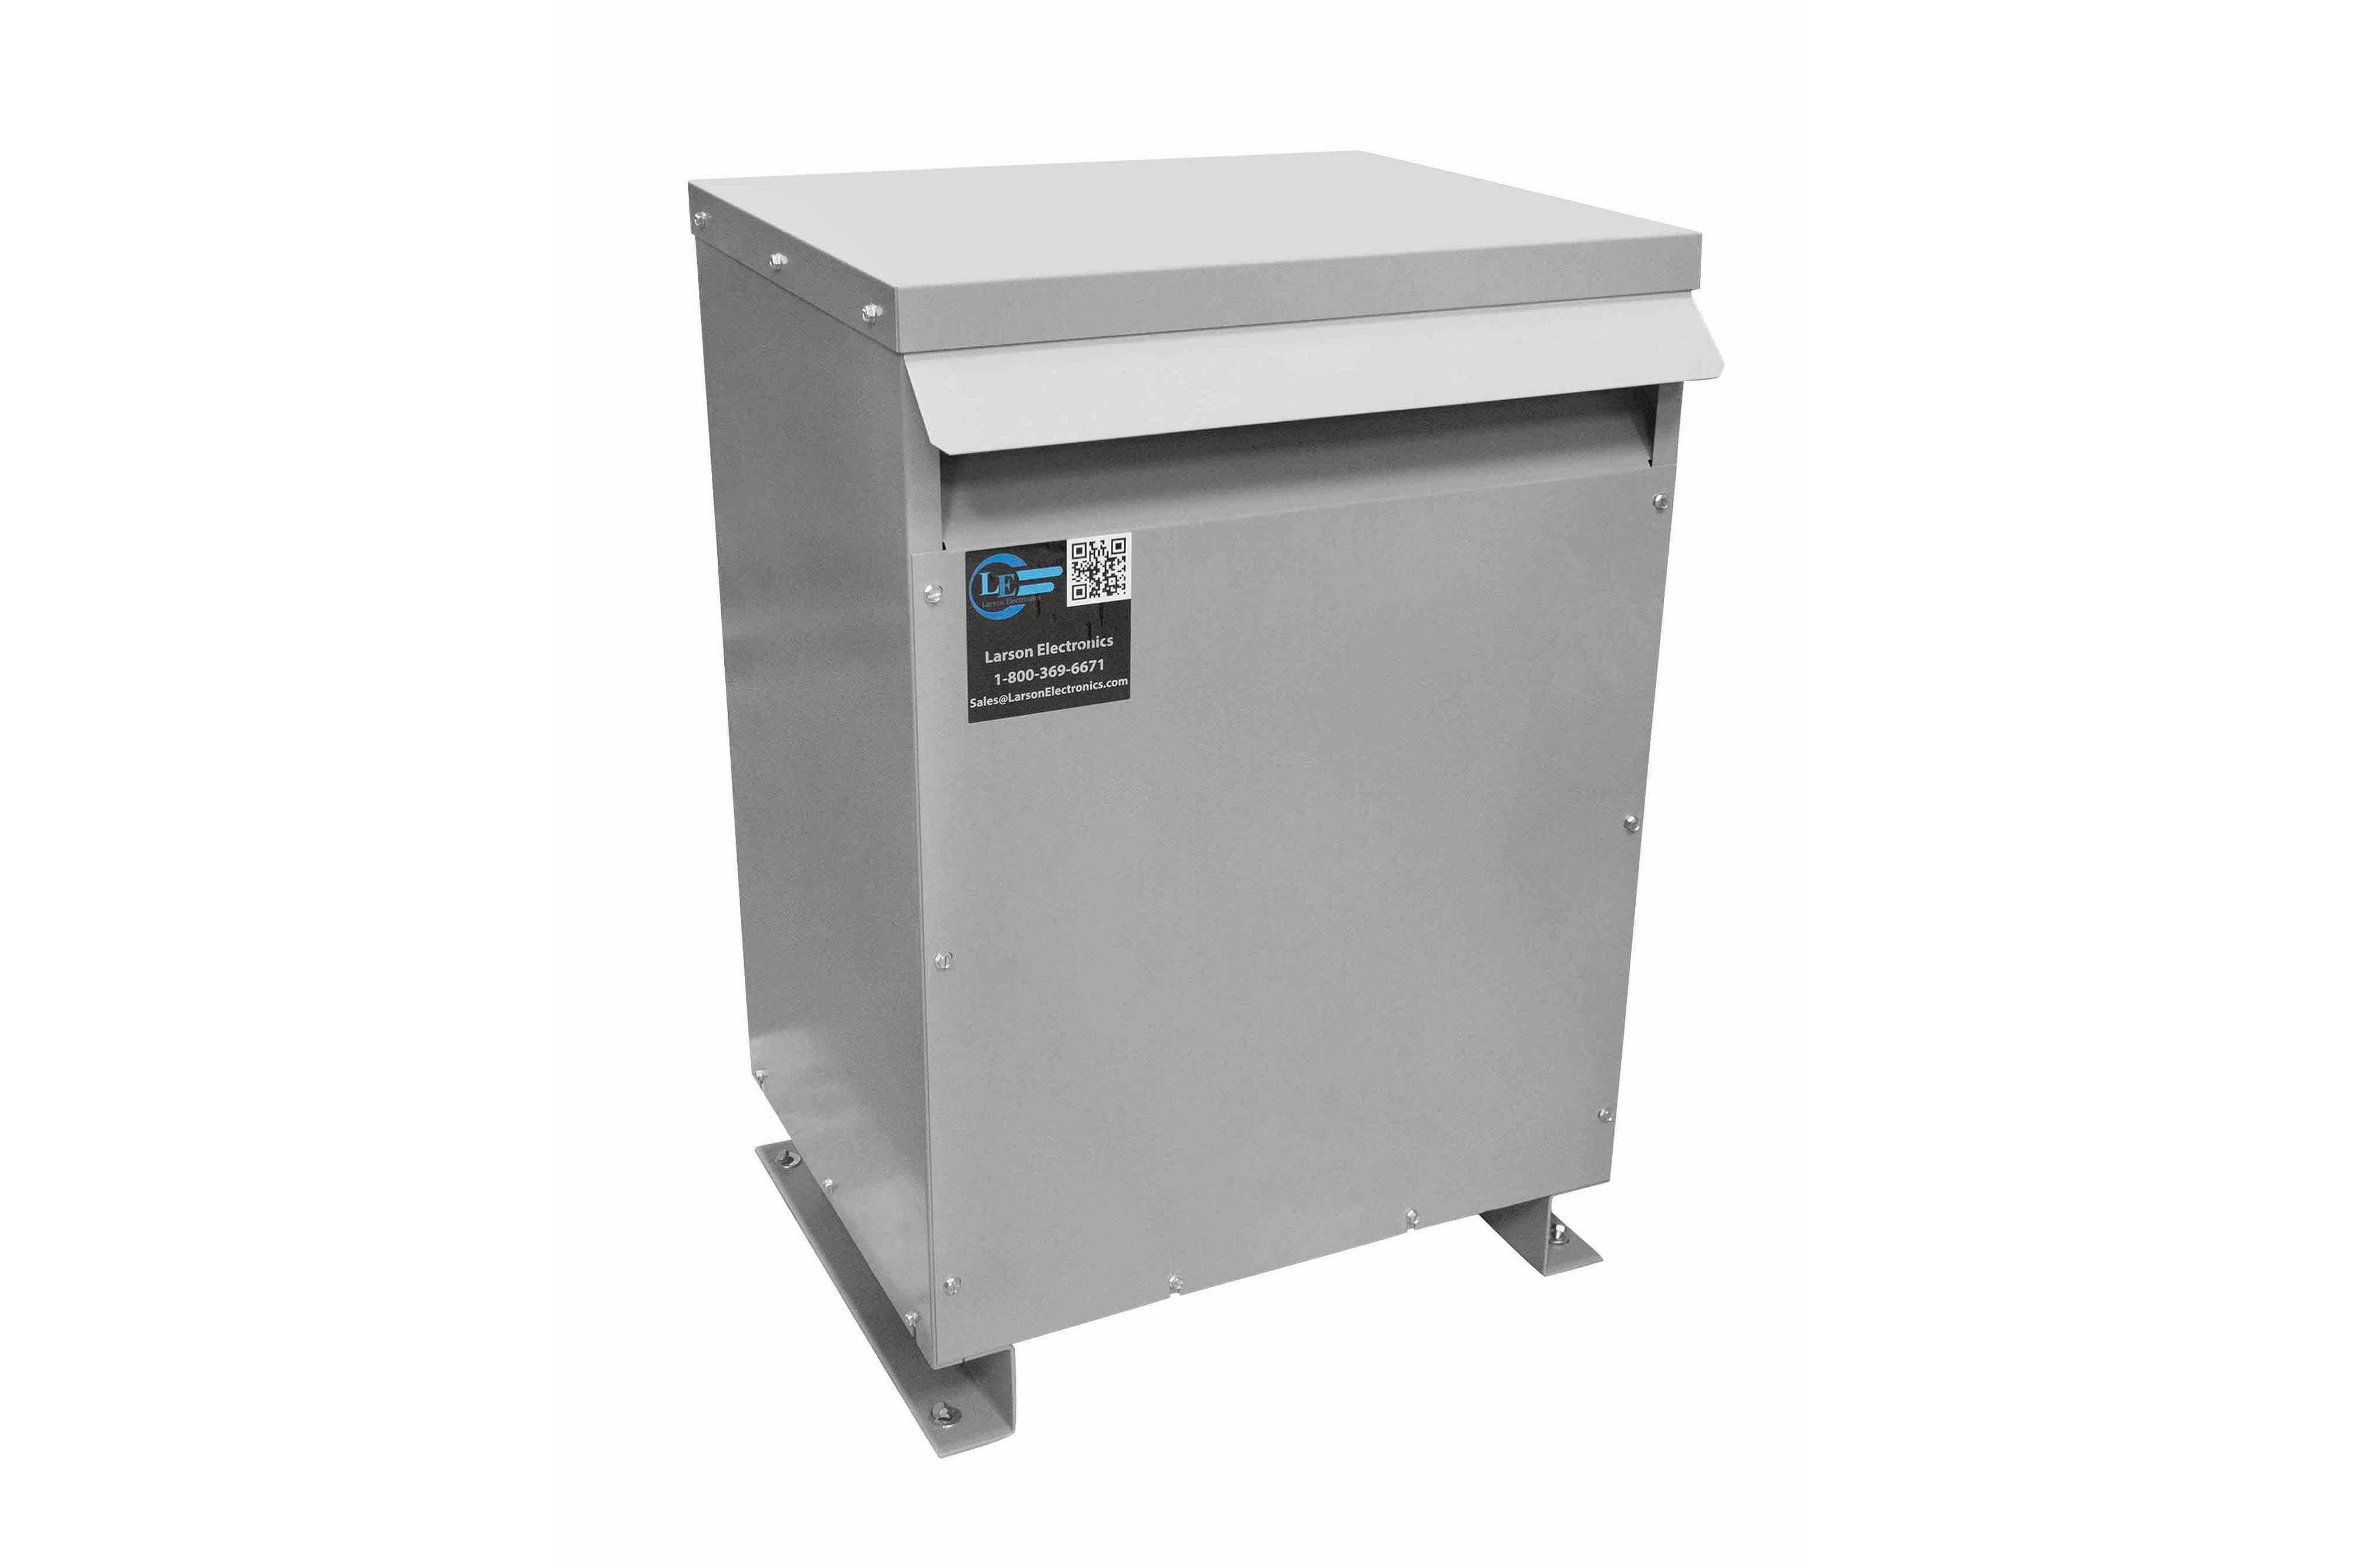 55 kVA 3PH Isolation Transformer, 460V Wye Primary, 380V Delta Secondary, N3R, Ventilated, 60 Hz